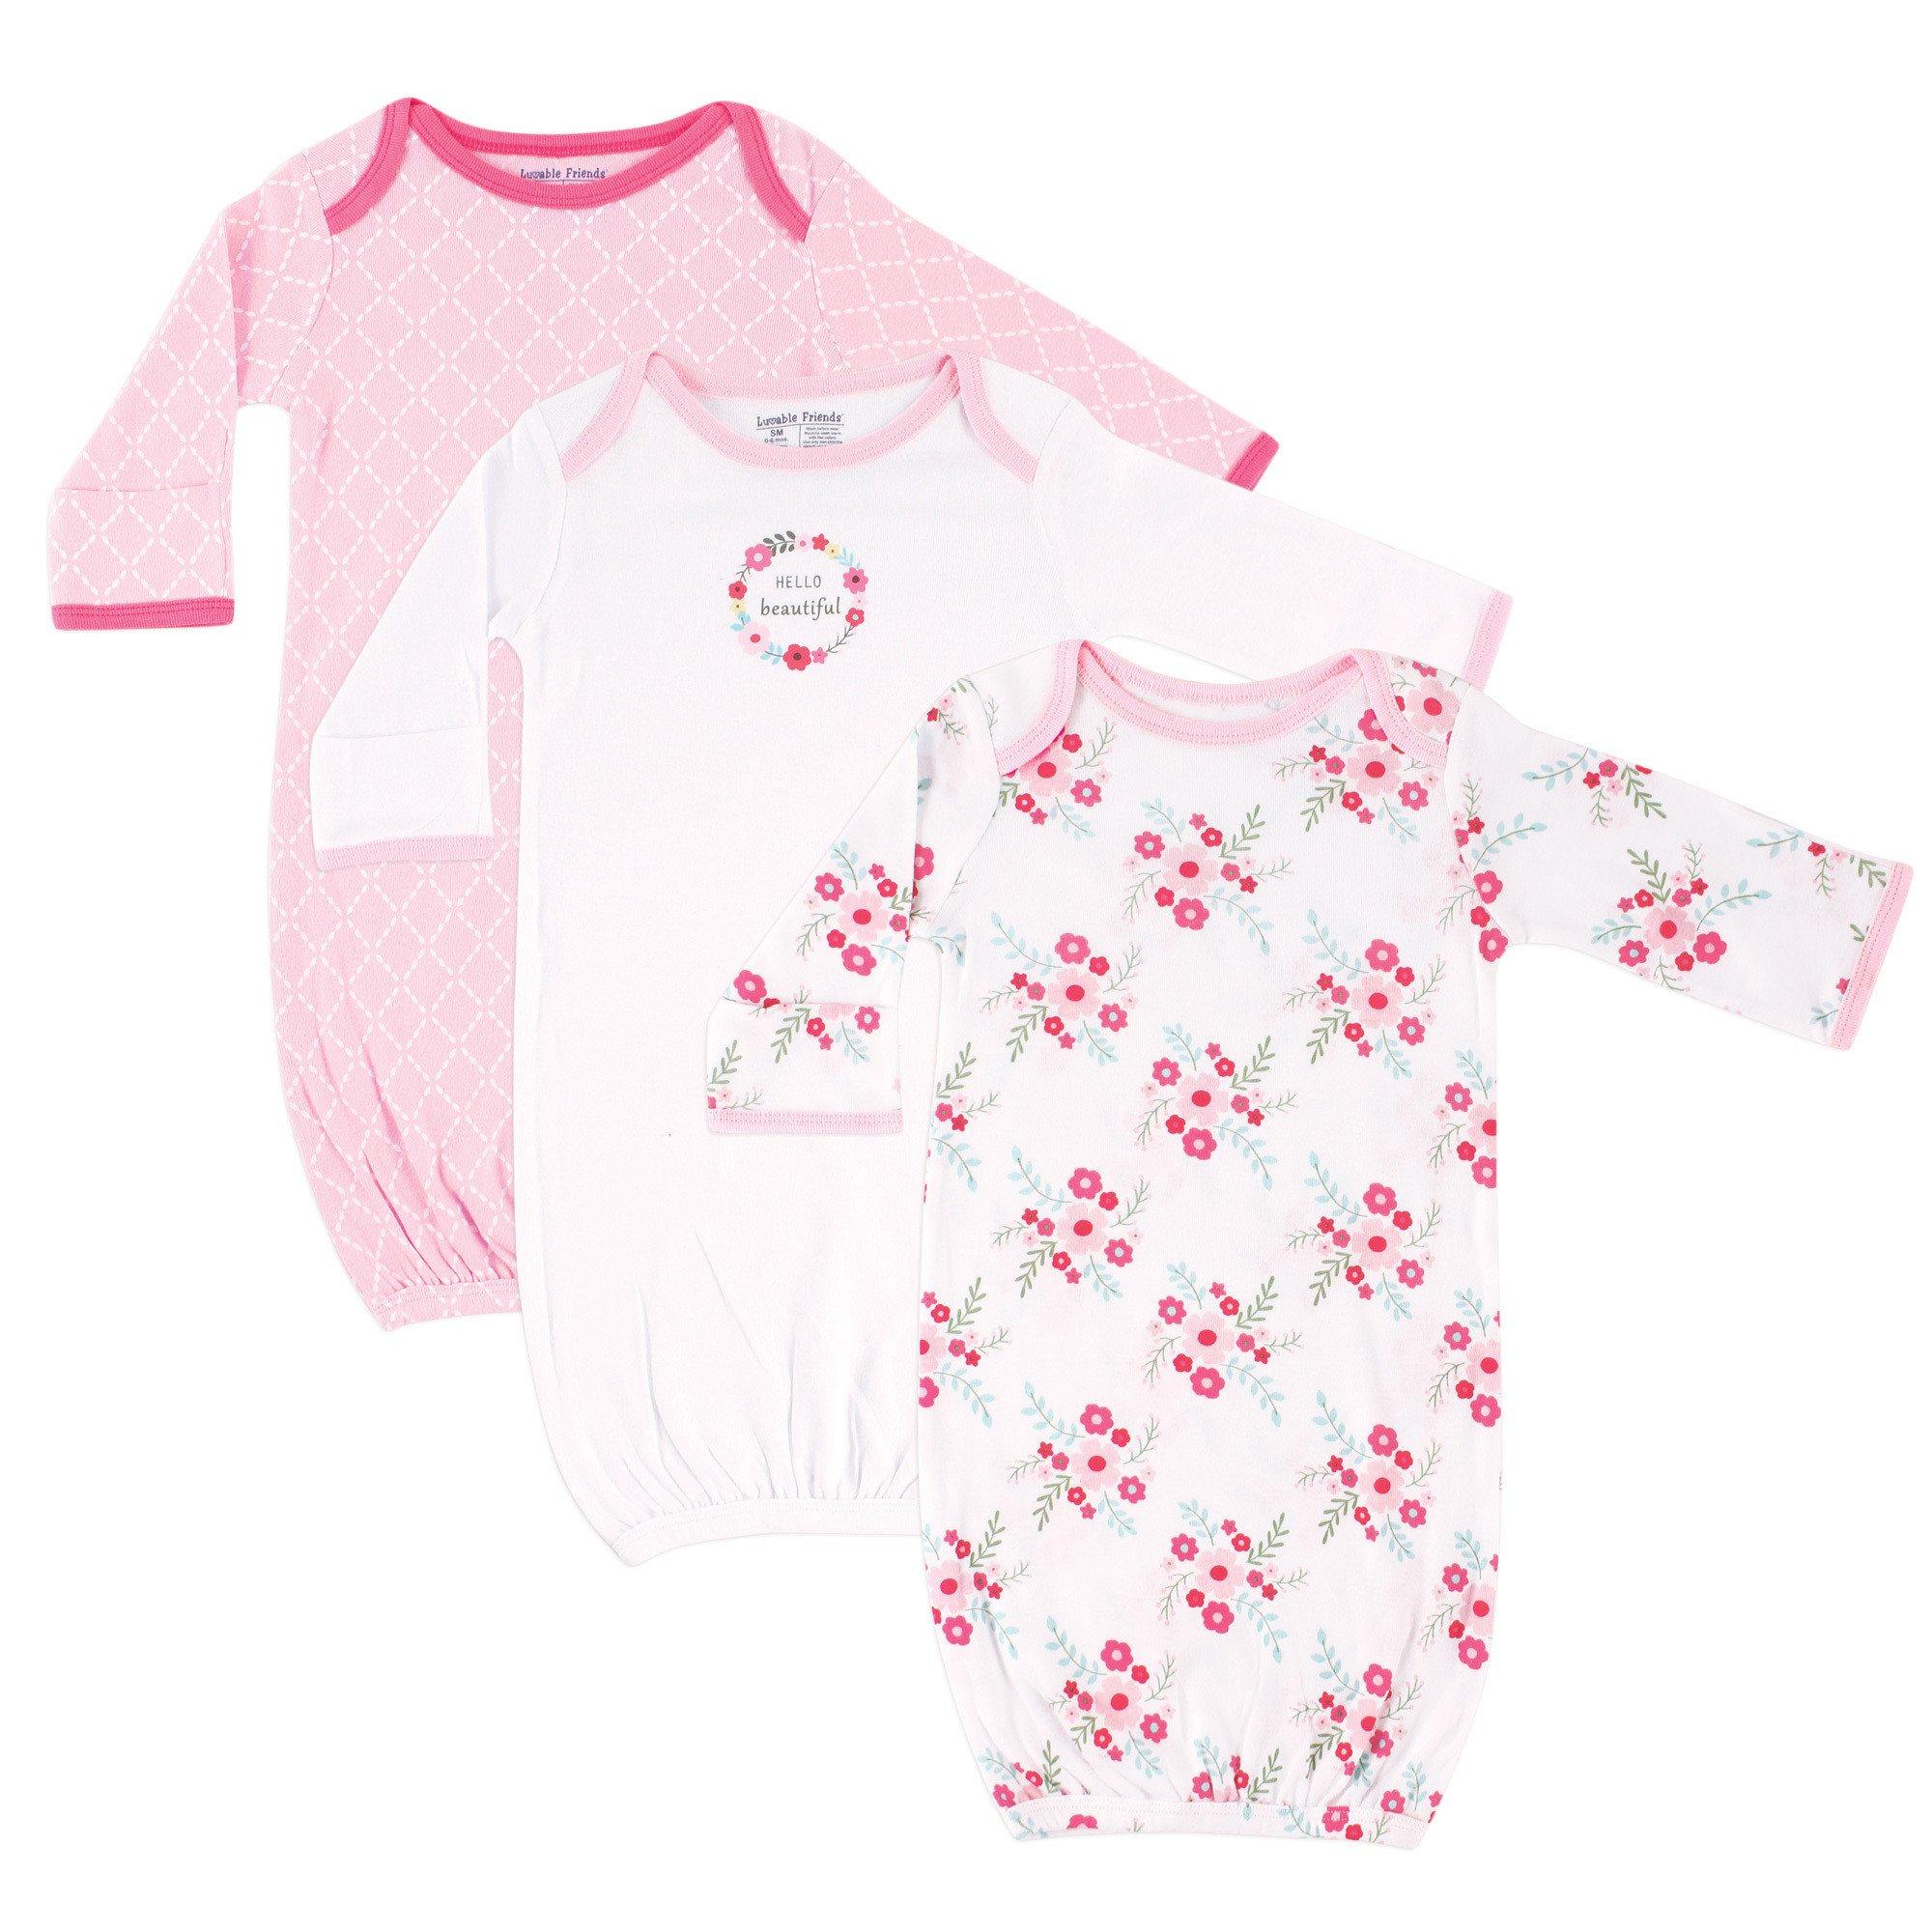 Luvable Friends Unisex 3 Pack Cotton Gown, Pink Floral, 0-6 Months